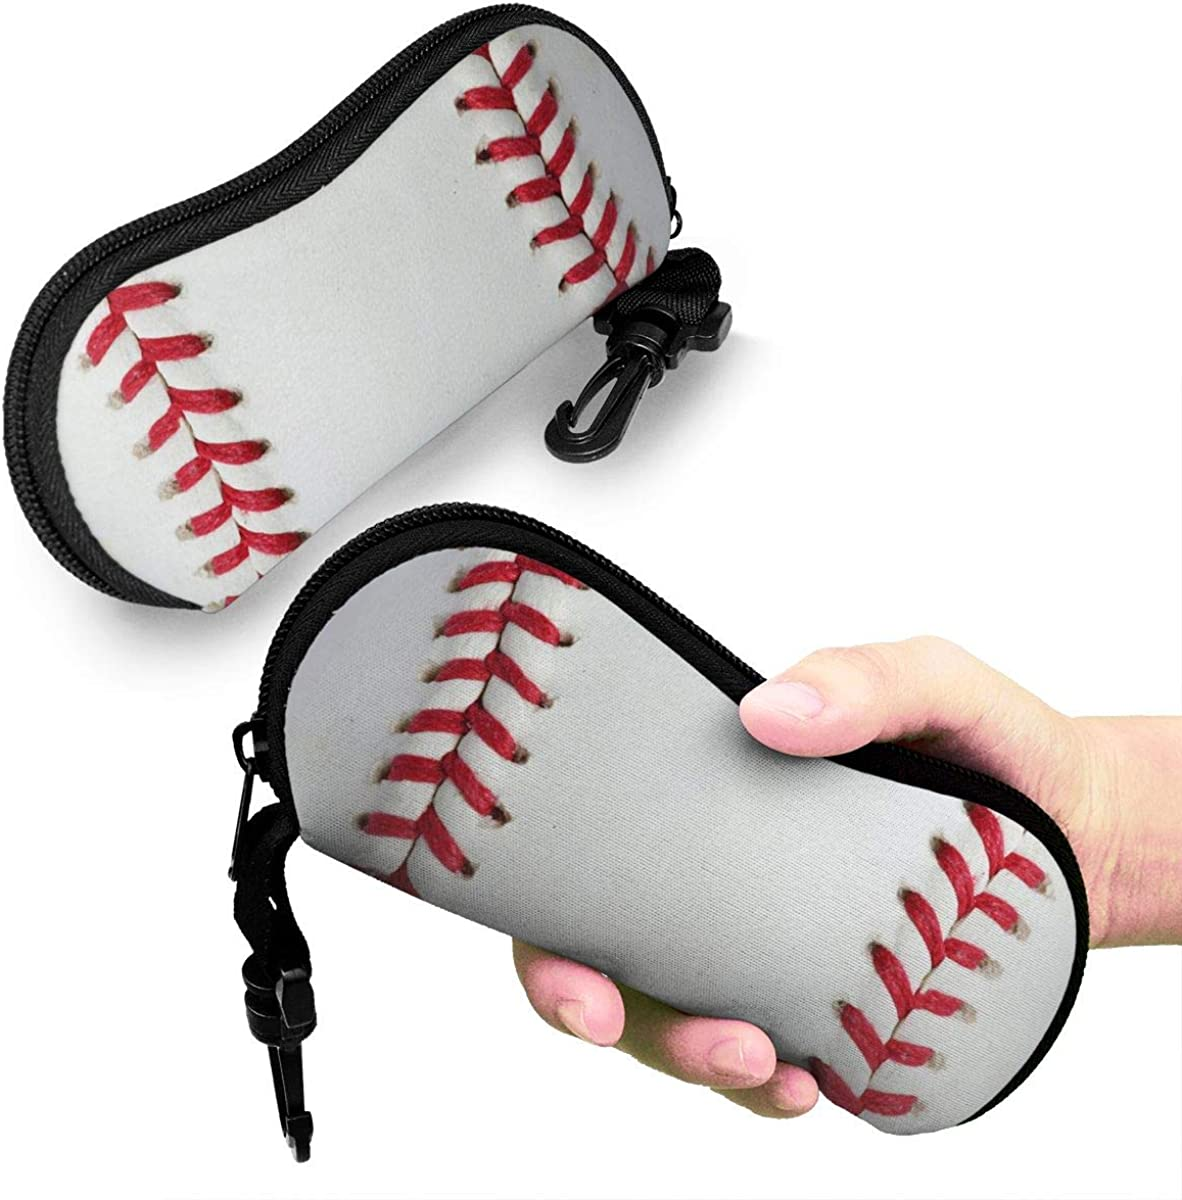 Baseball Print Sunglasses Soft Case Ultra Light Neoprene Zipper Eyeglass Case With Key Chain